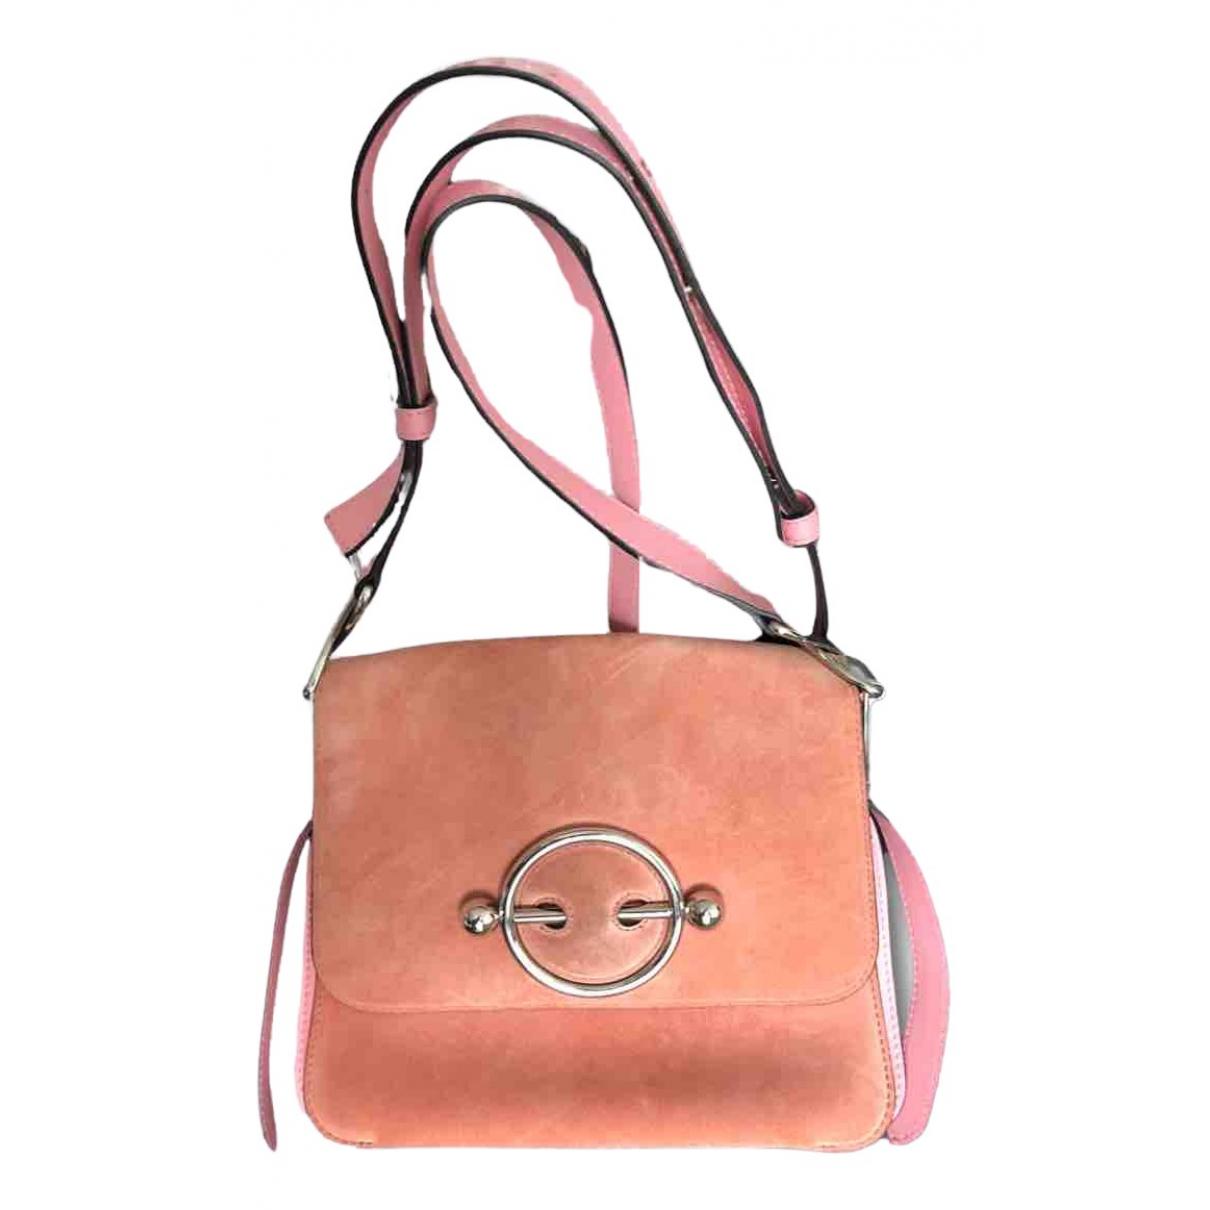 J.w. Anderson Pierce Pink Suede handbag for Women \N